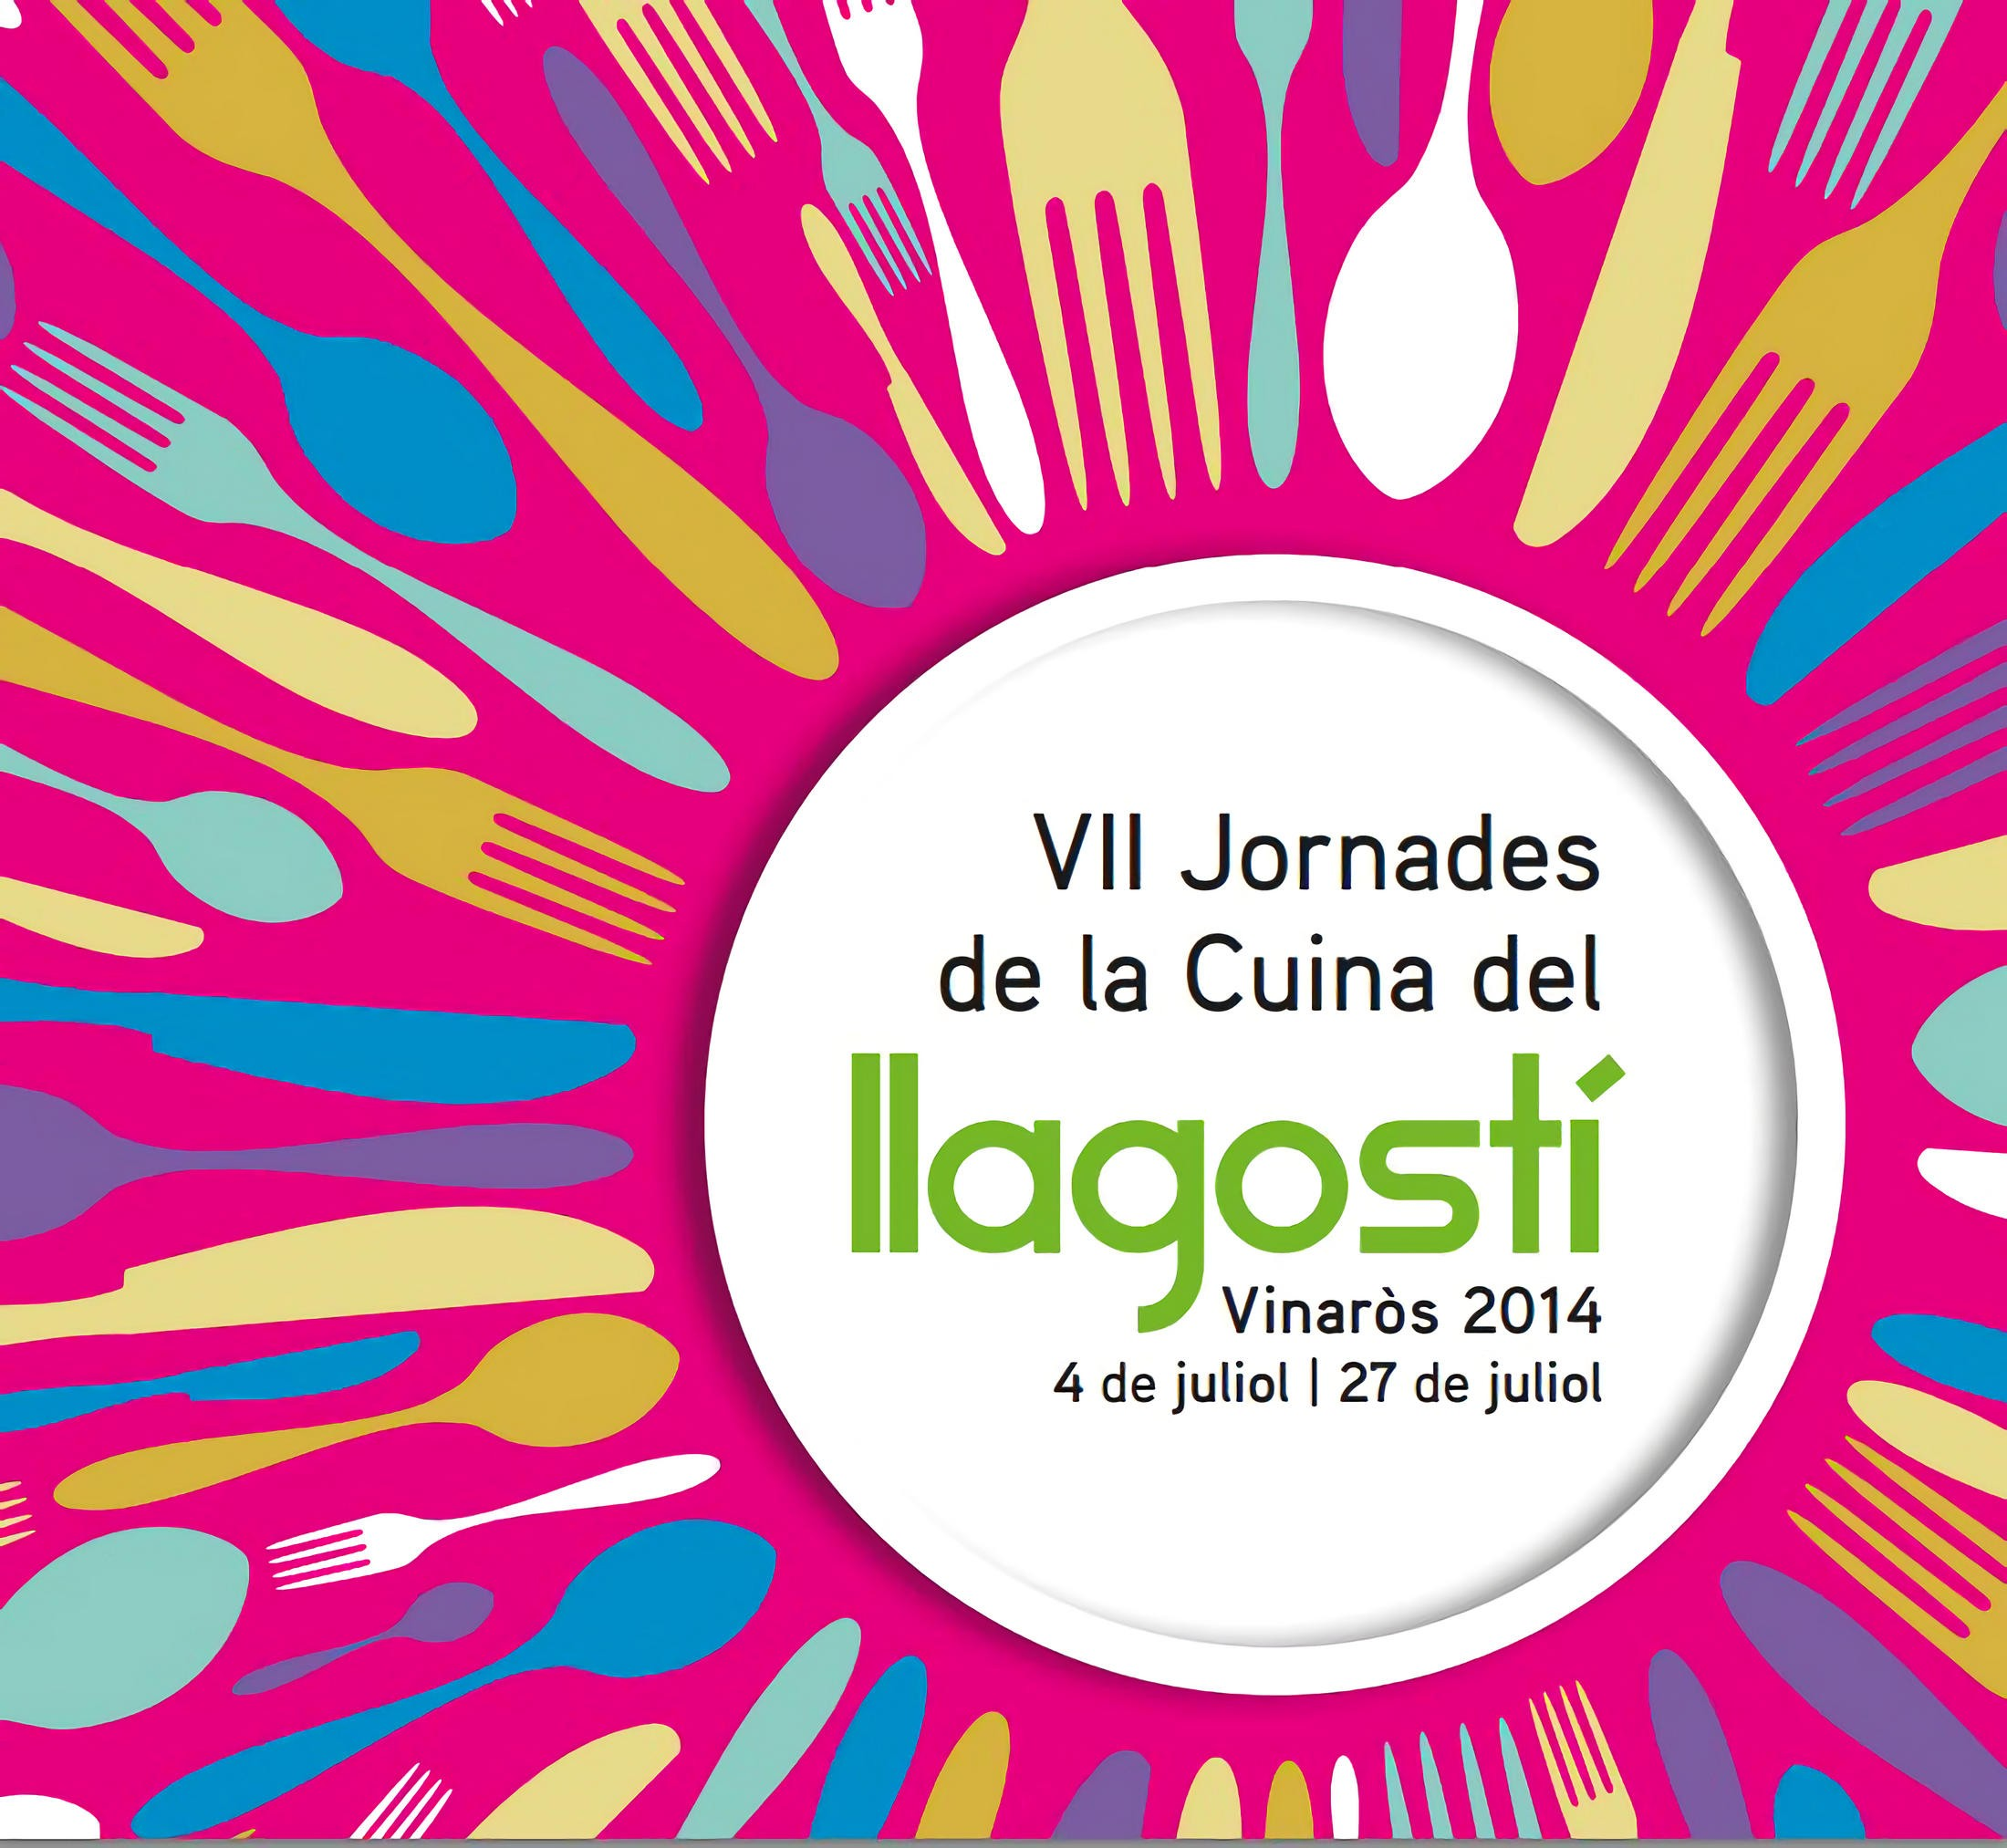 VII Jornadas de Cocina del Langostino de Vinaròs